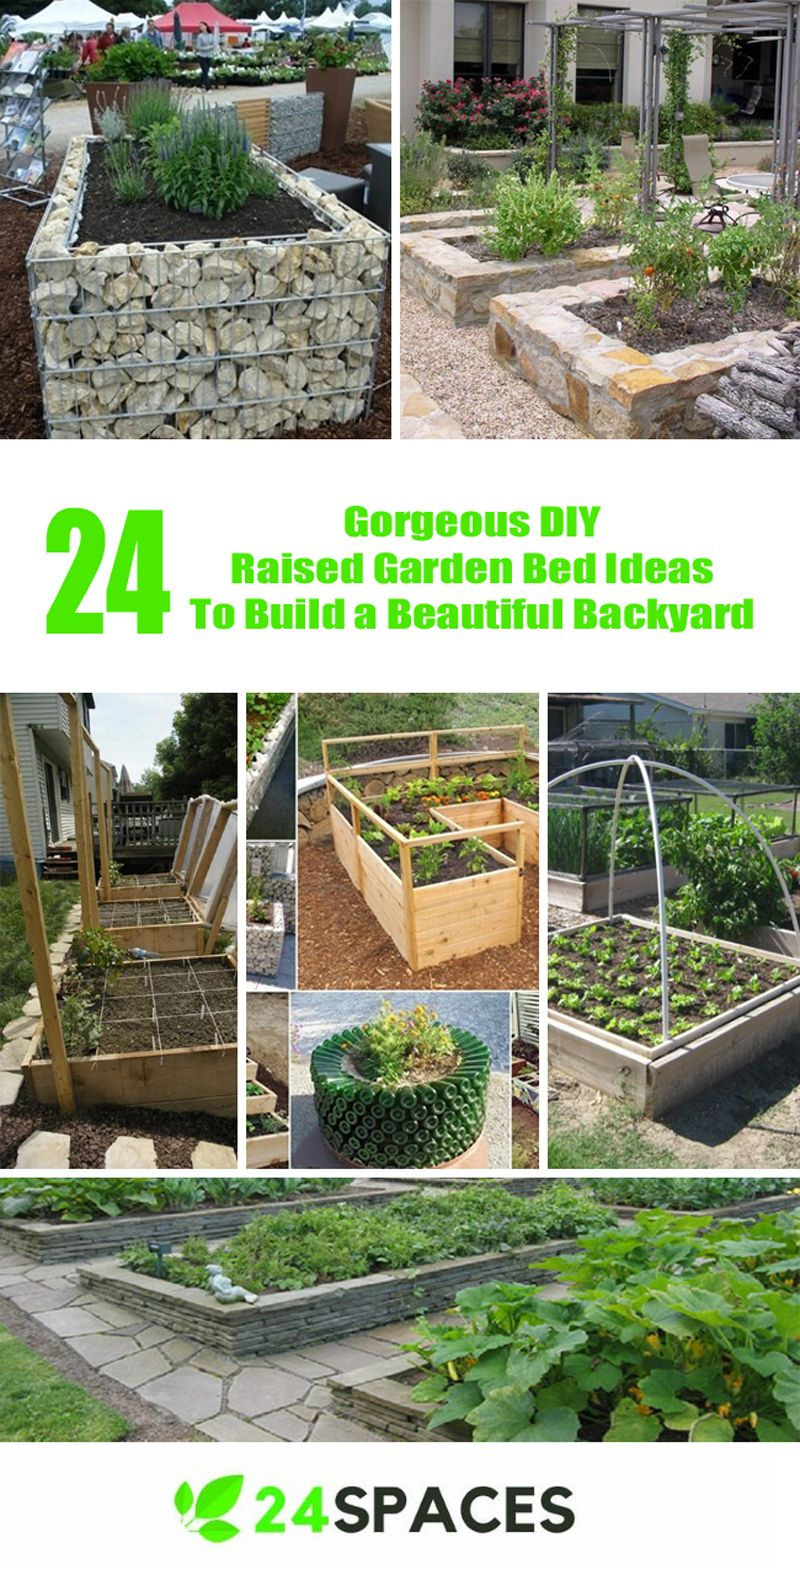 24 Gorgeous Diy Raised Garden Bed Ideas To Build A Beautiful Backyard Raised Garden Diy Raised Garden Building Raised Vegetable Garden